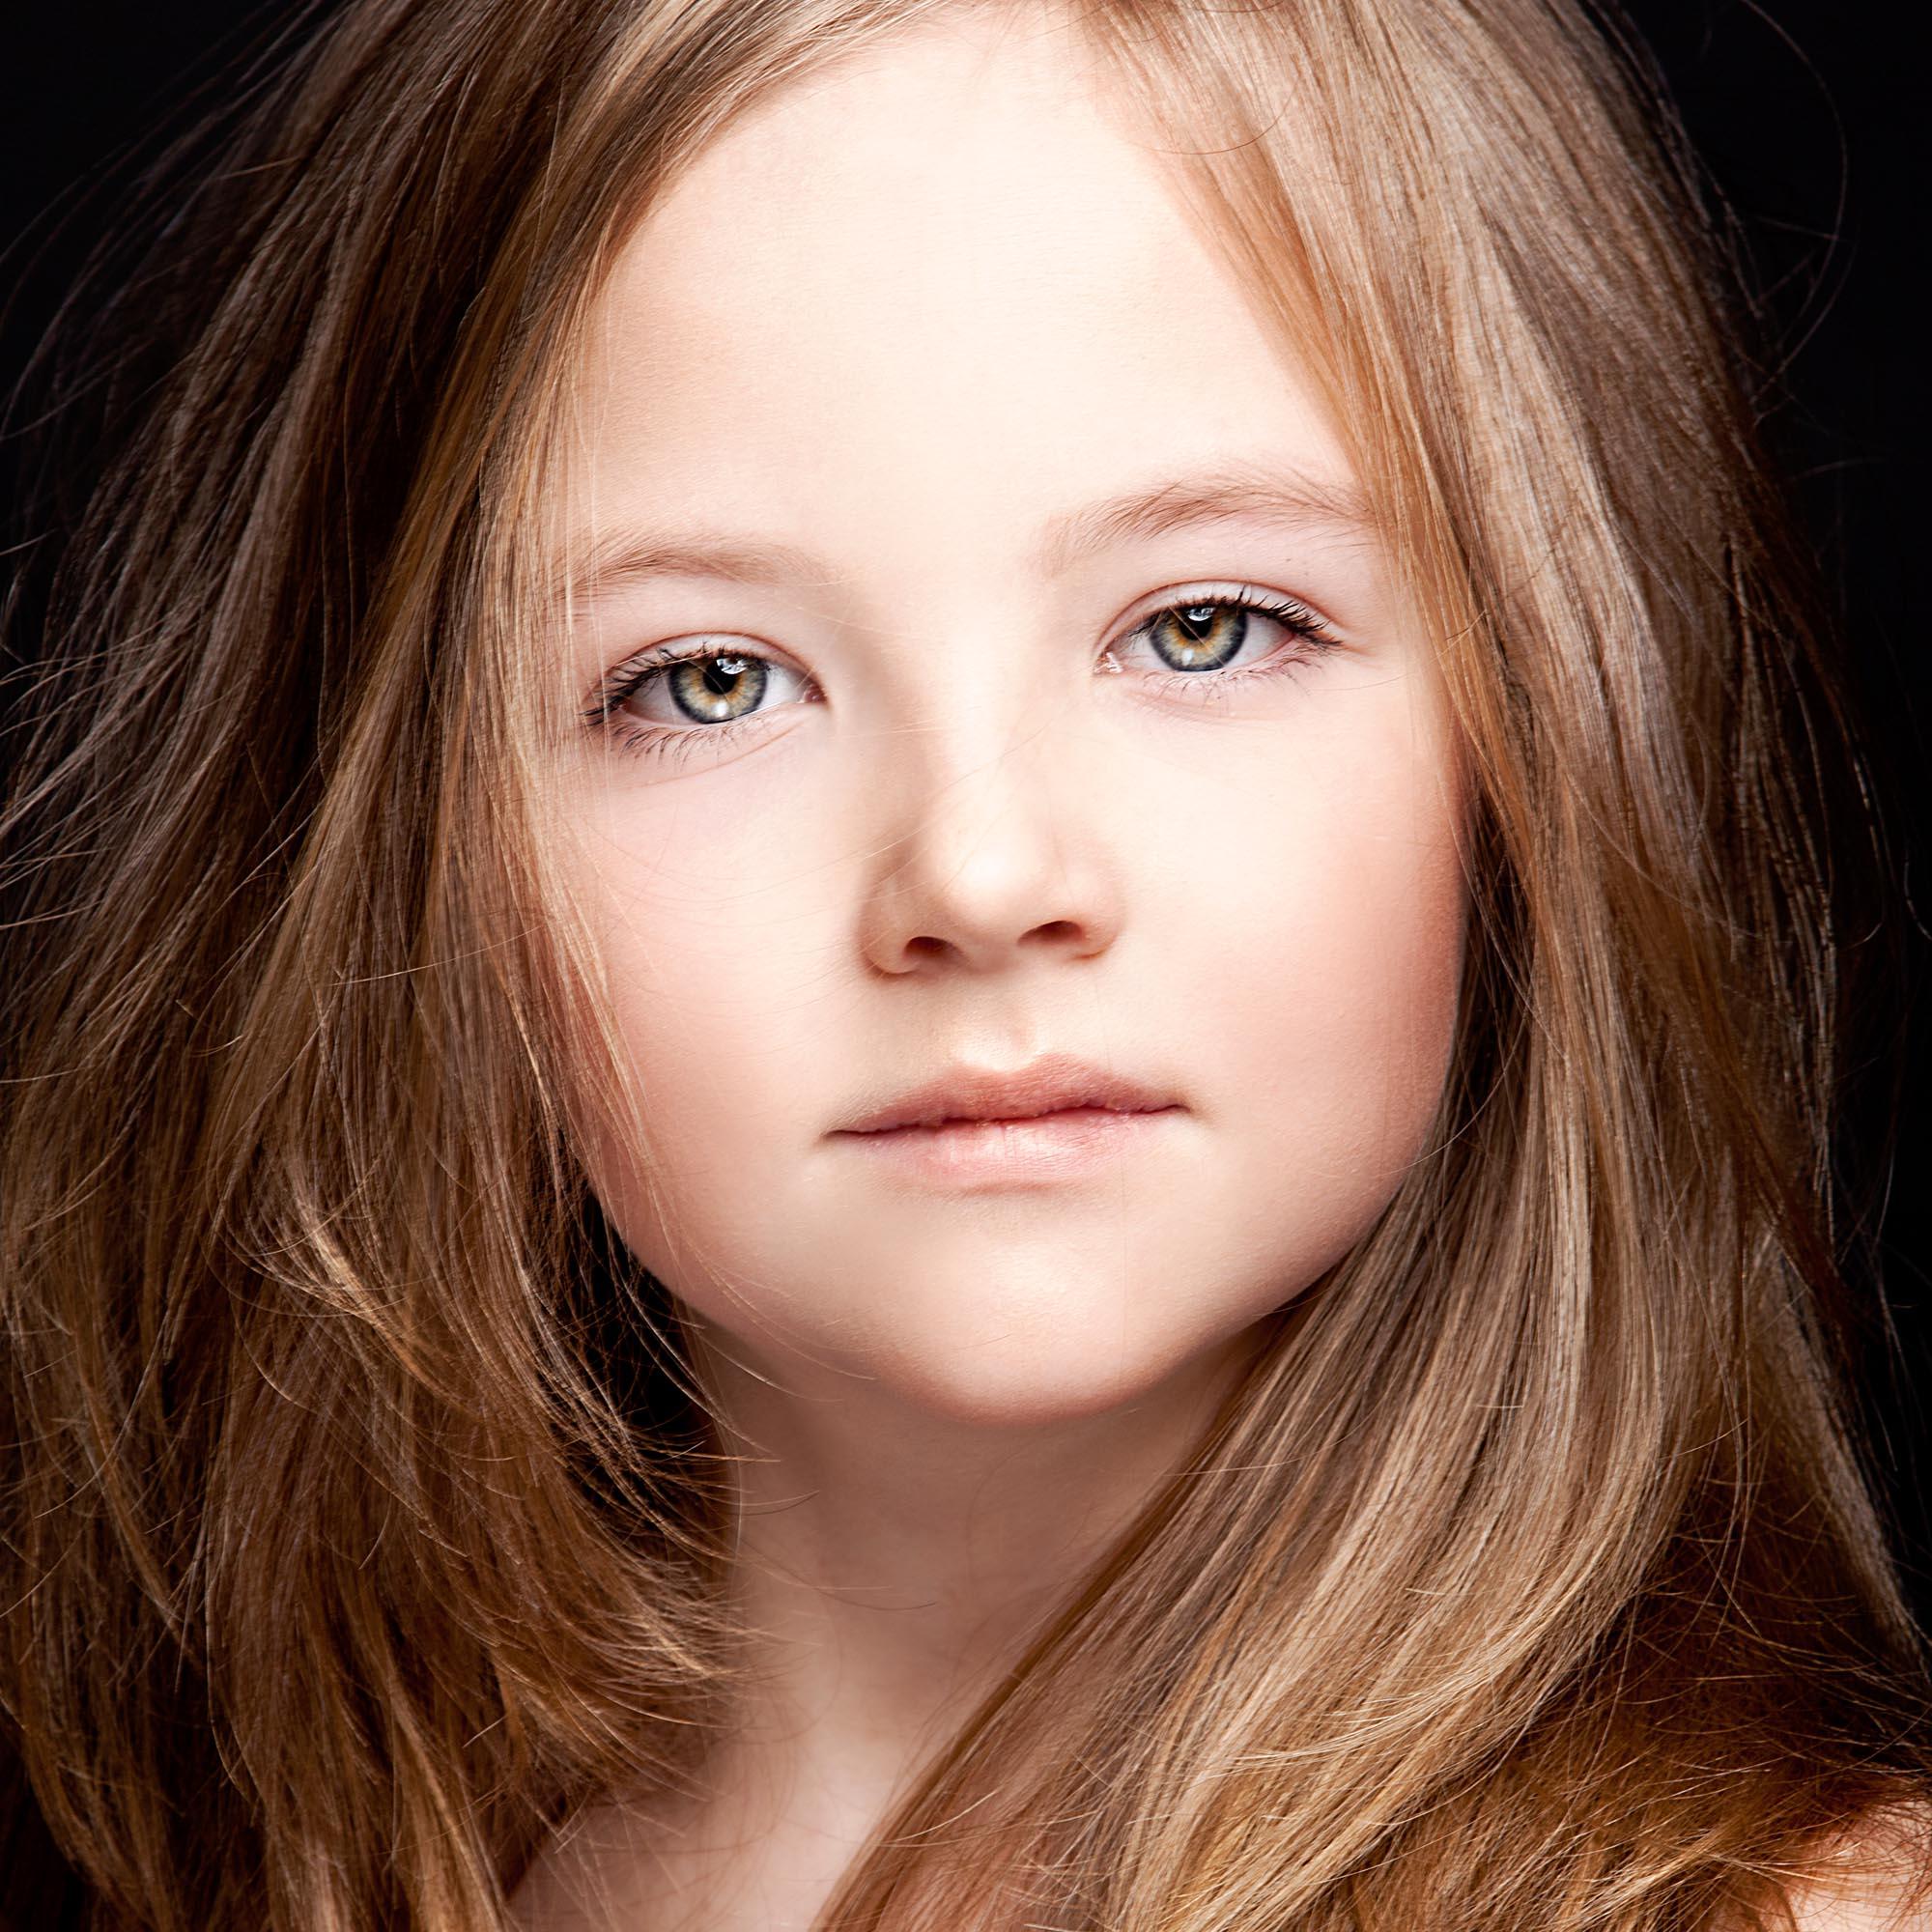 nyc-photographers-kids-modeling-10013.jpg